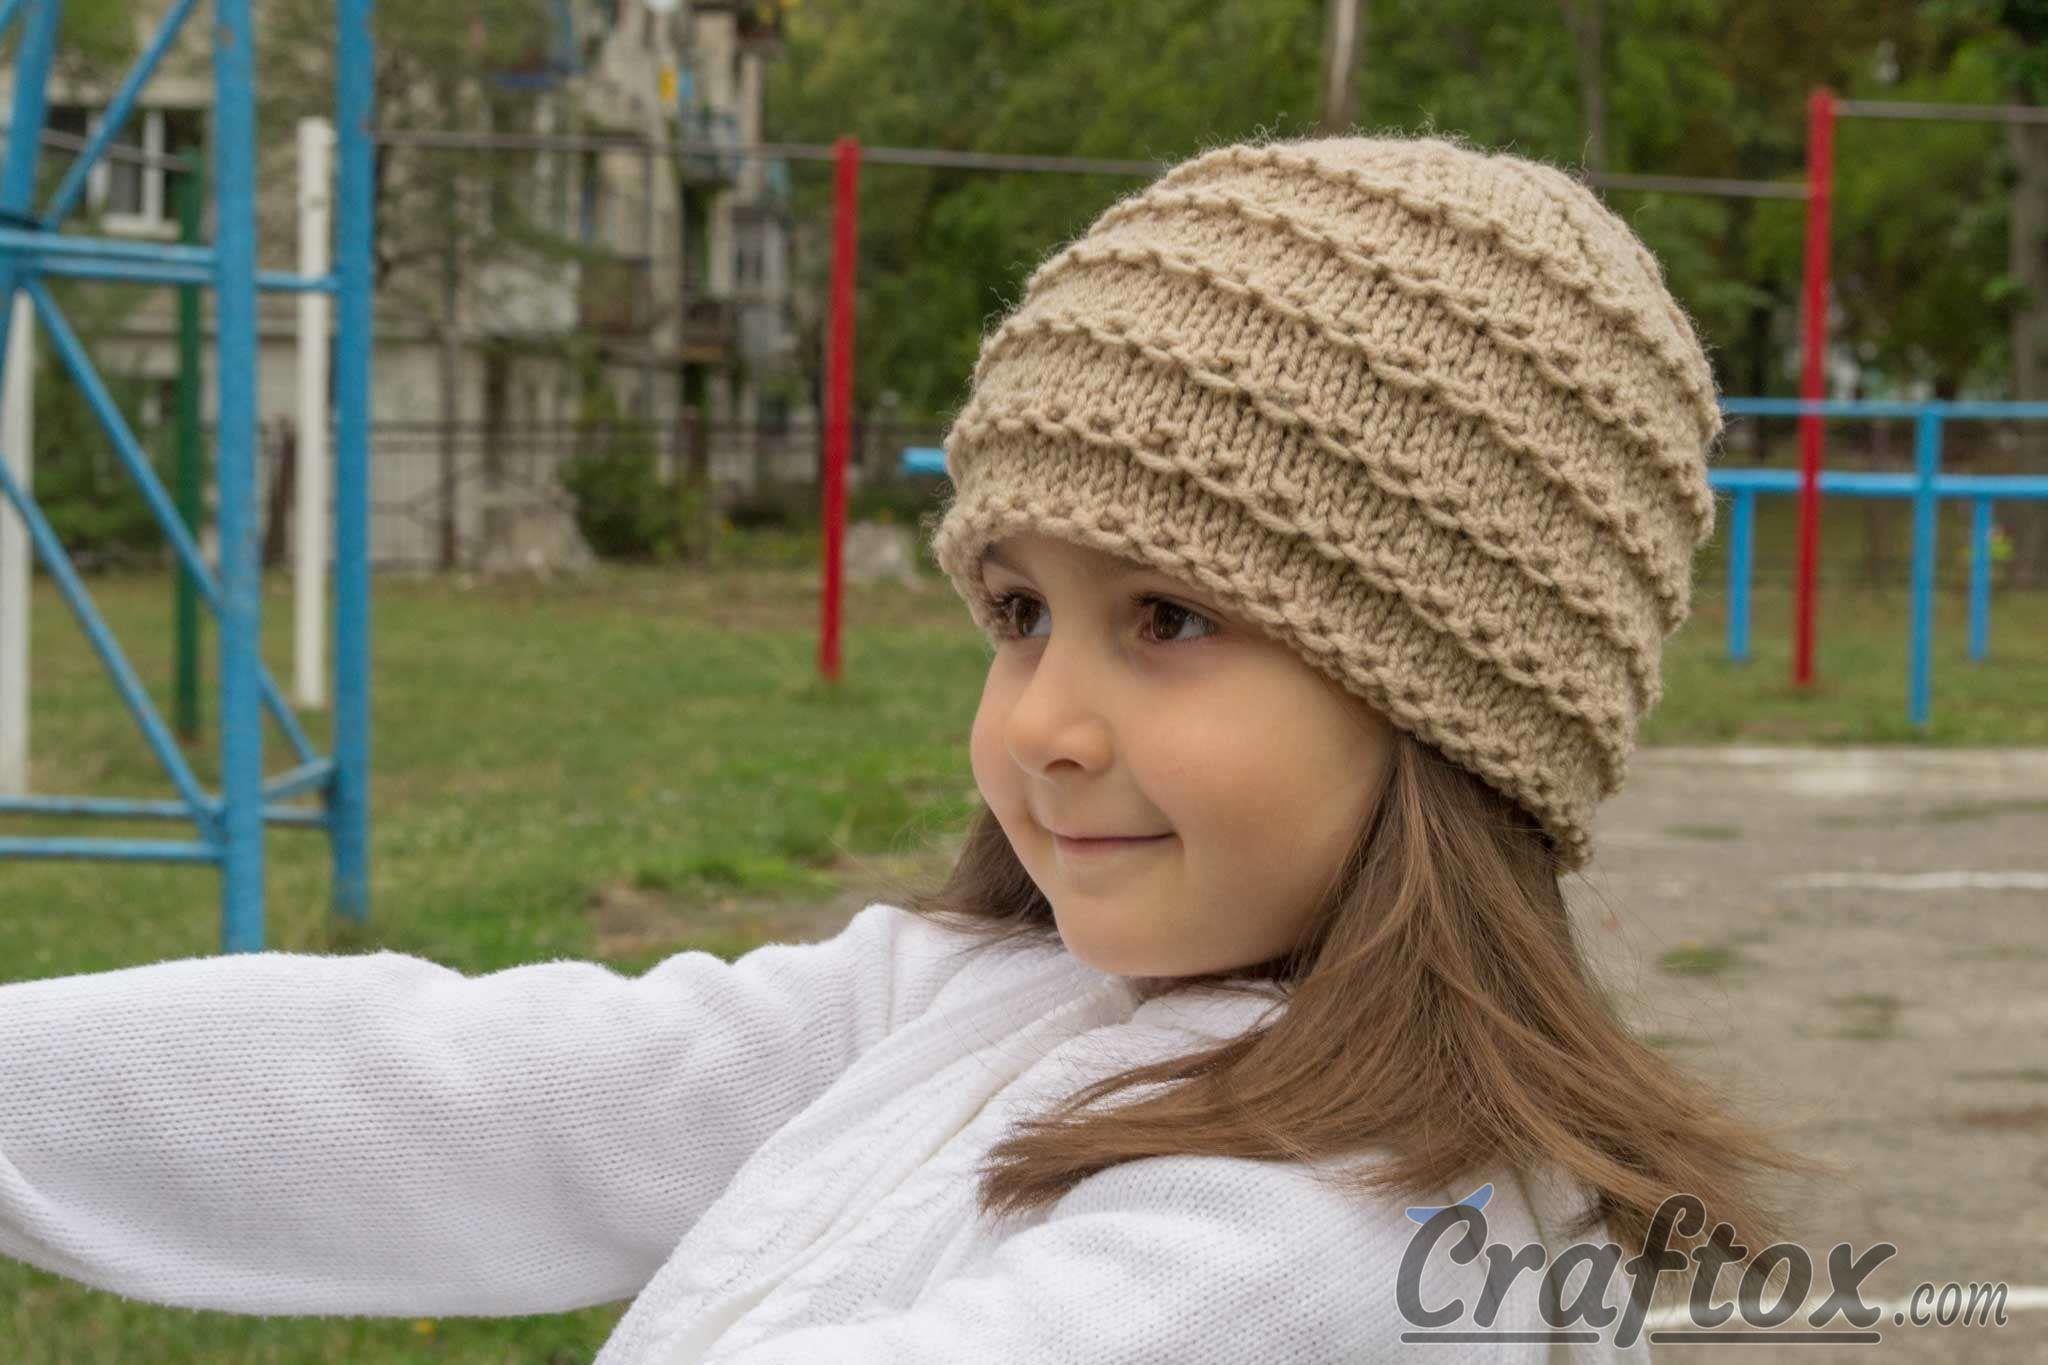 Easy Beanie Knitting Pattern Free : Easy beanie knitting pattern free